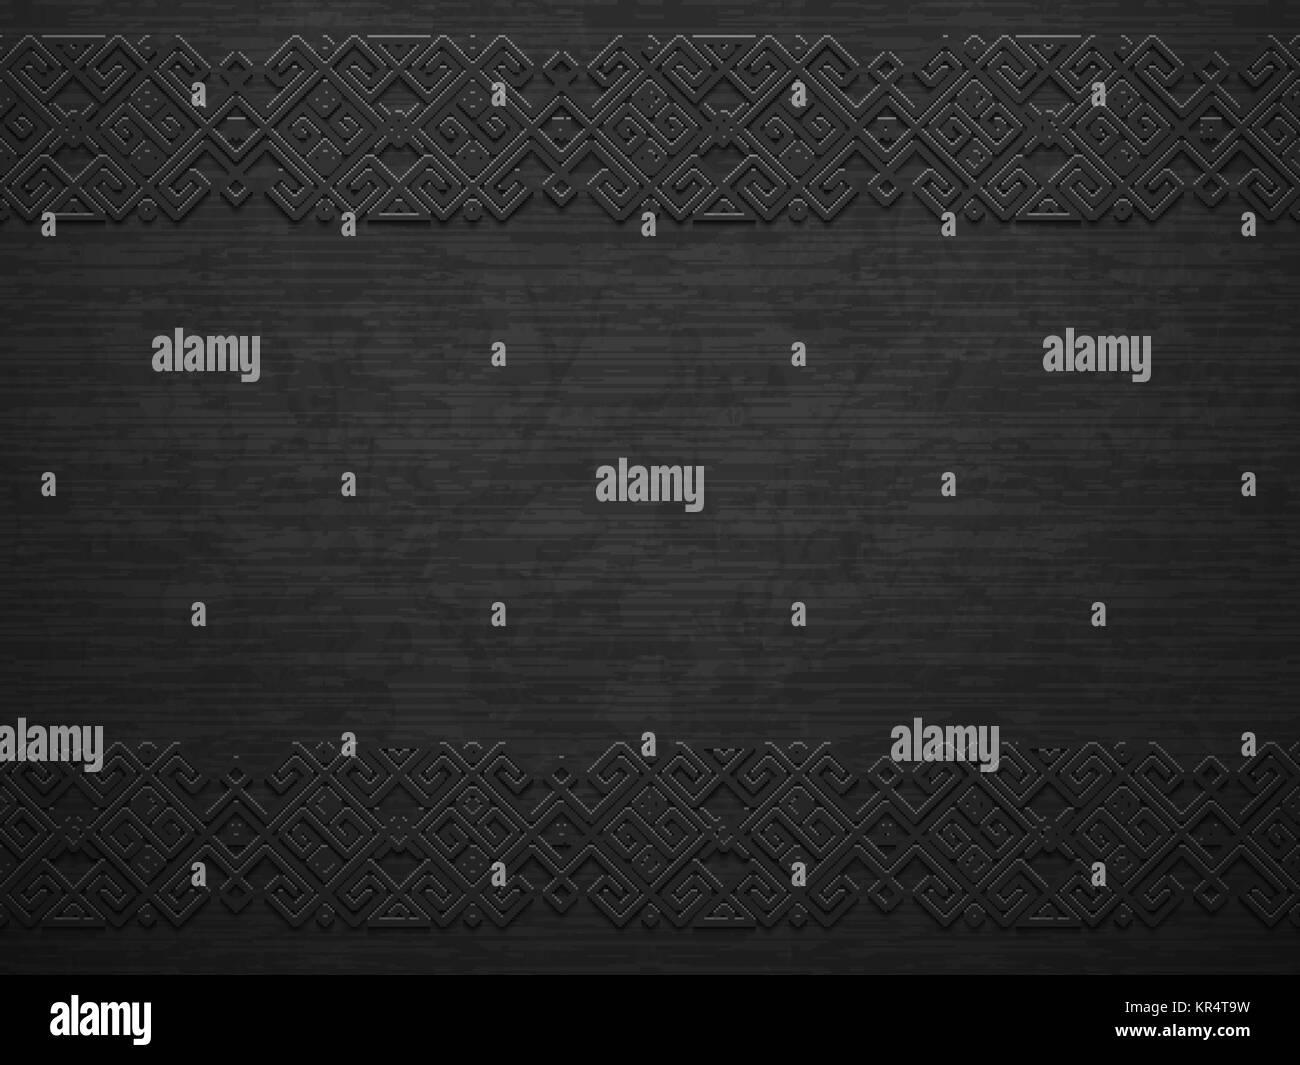 Vector grunge rough dark metal background with scandinavian pattern. Iron material brutal ethnic geometric pattern - Stock Image